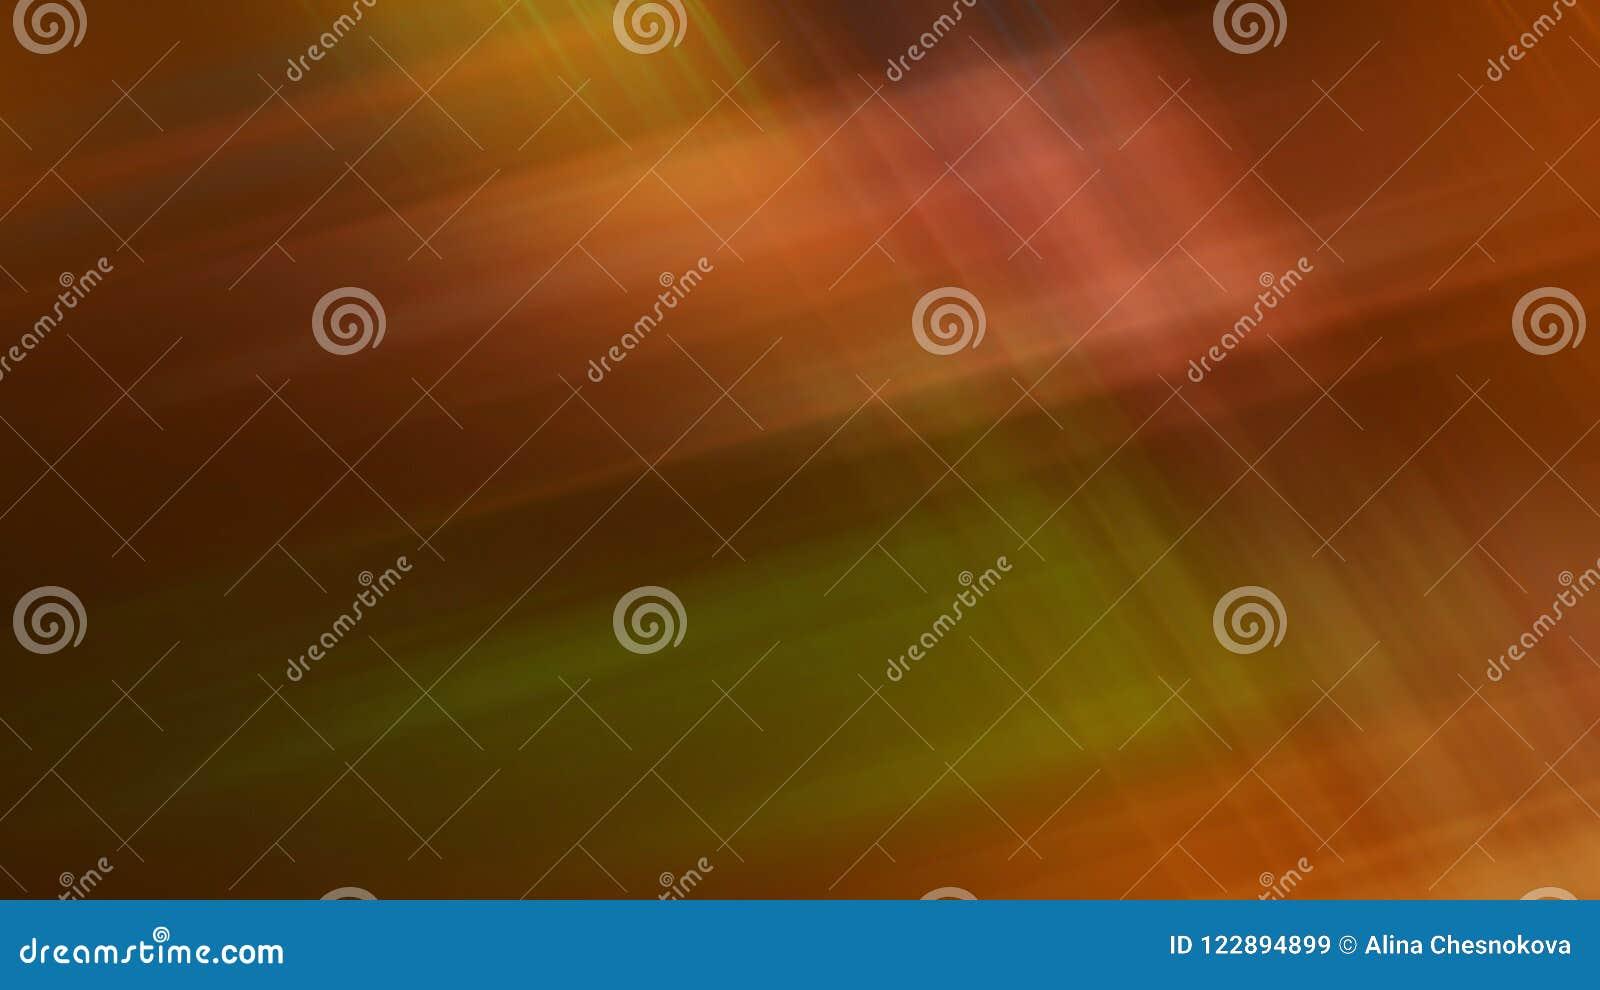 Пестротканая абстрактная предпосылка цепей световых маяков